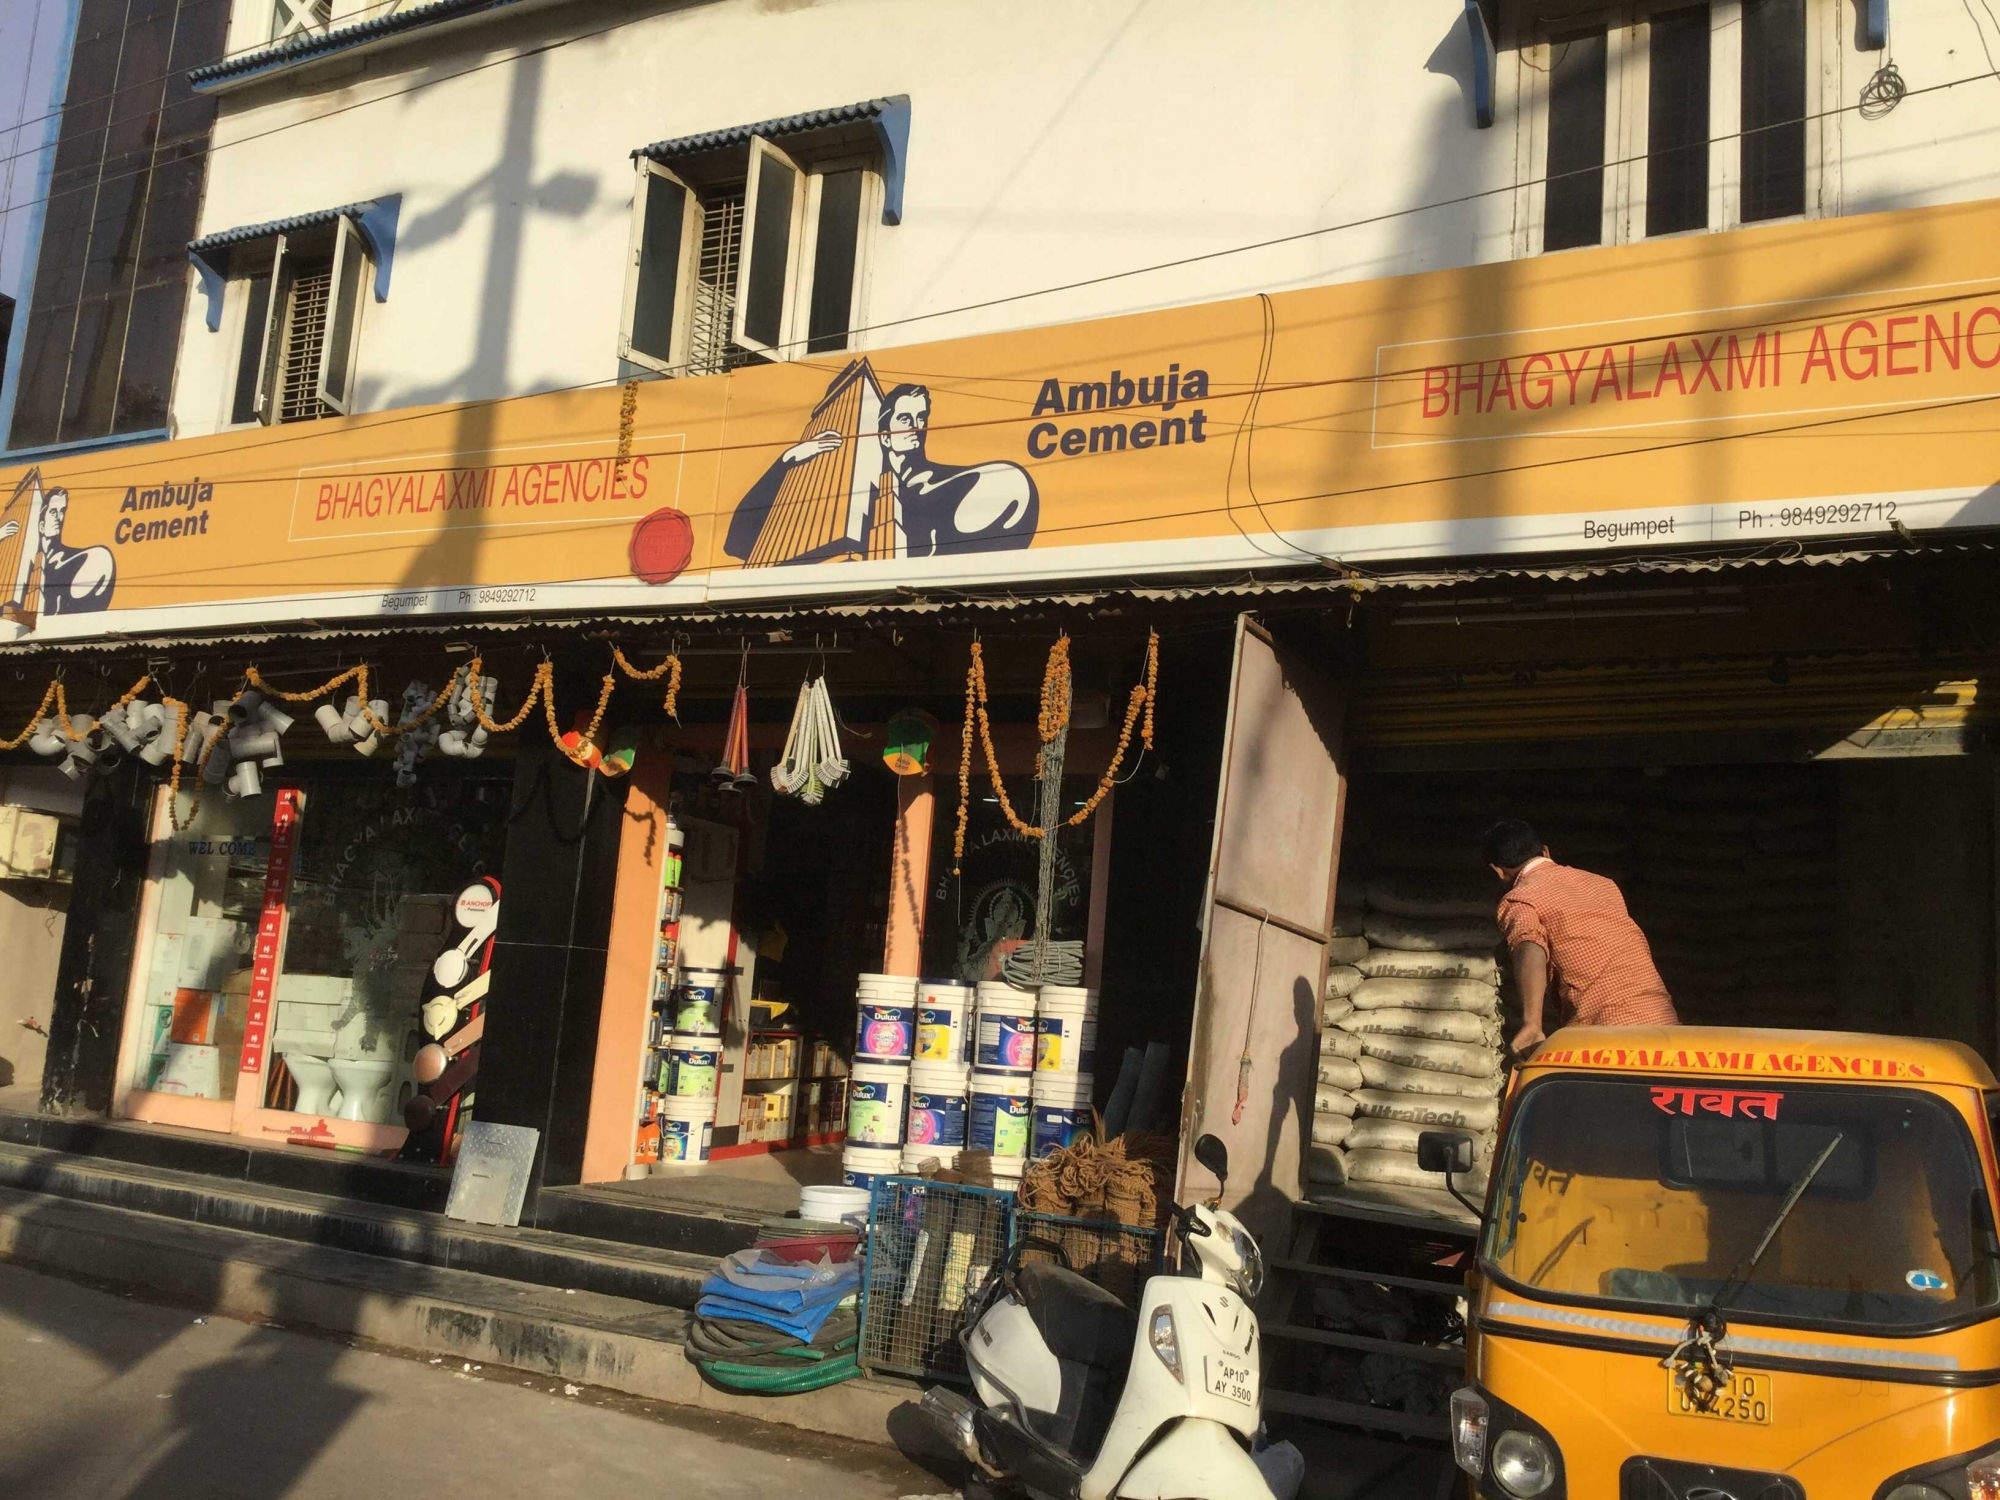 Top 30 Ici Dulux Paint in Miyapur - Best Ici Dulux Paint Hyderabad